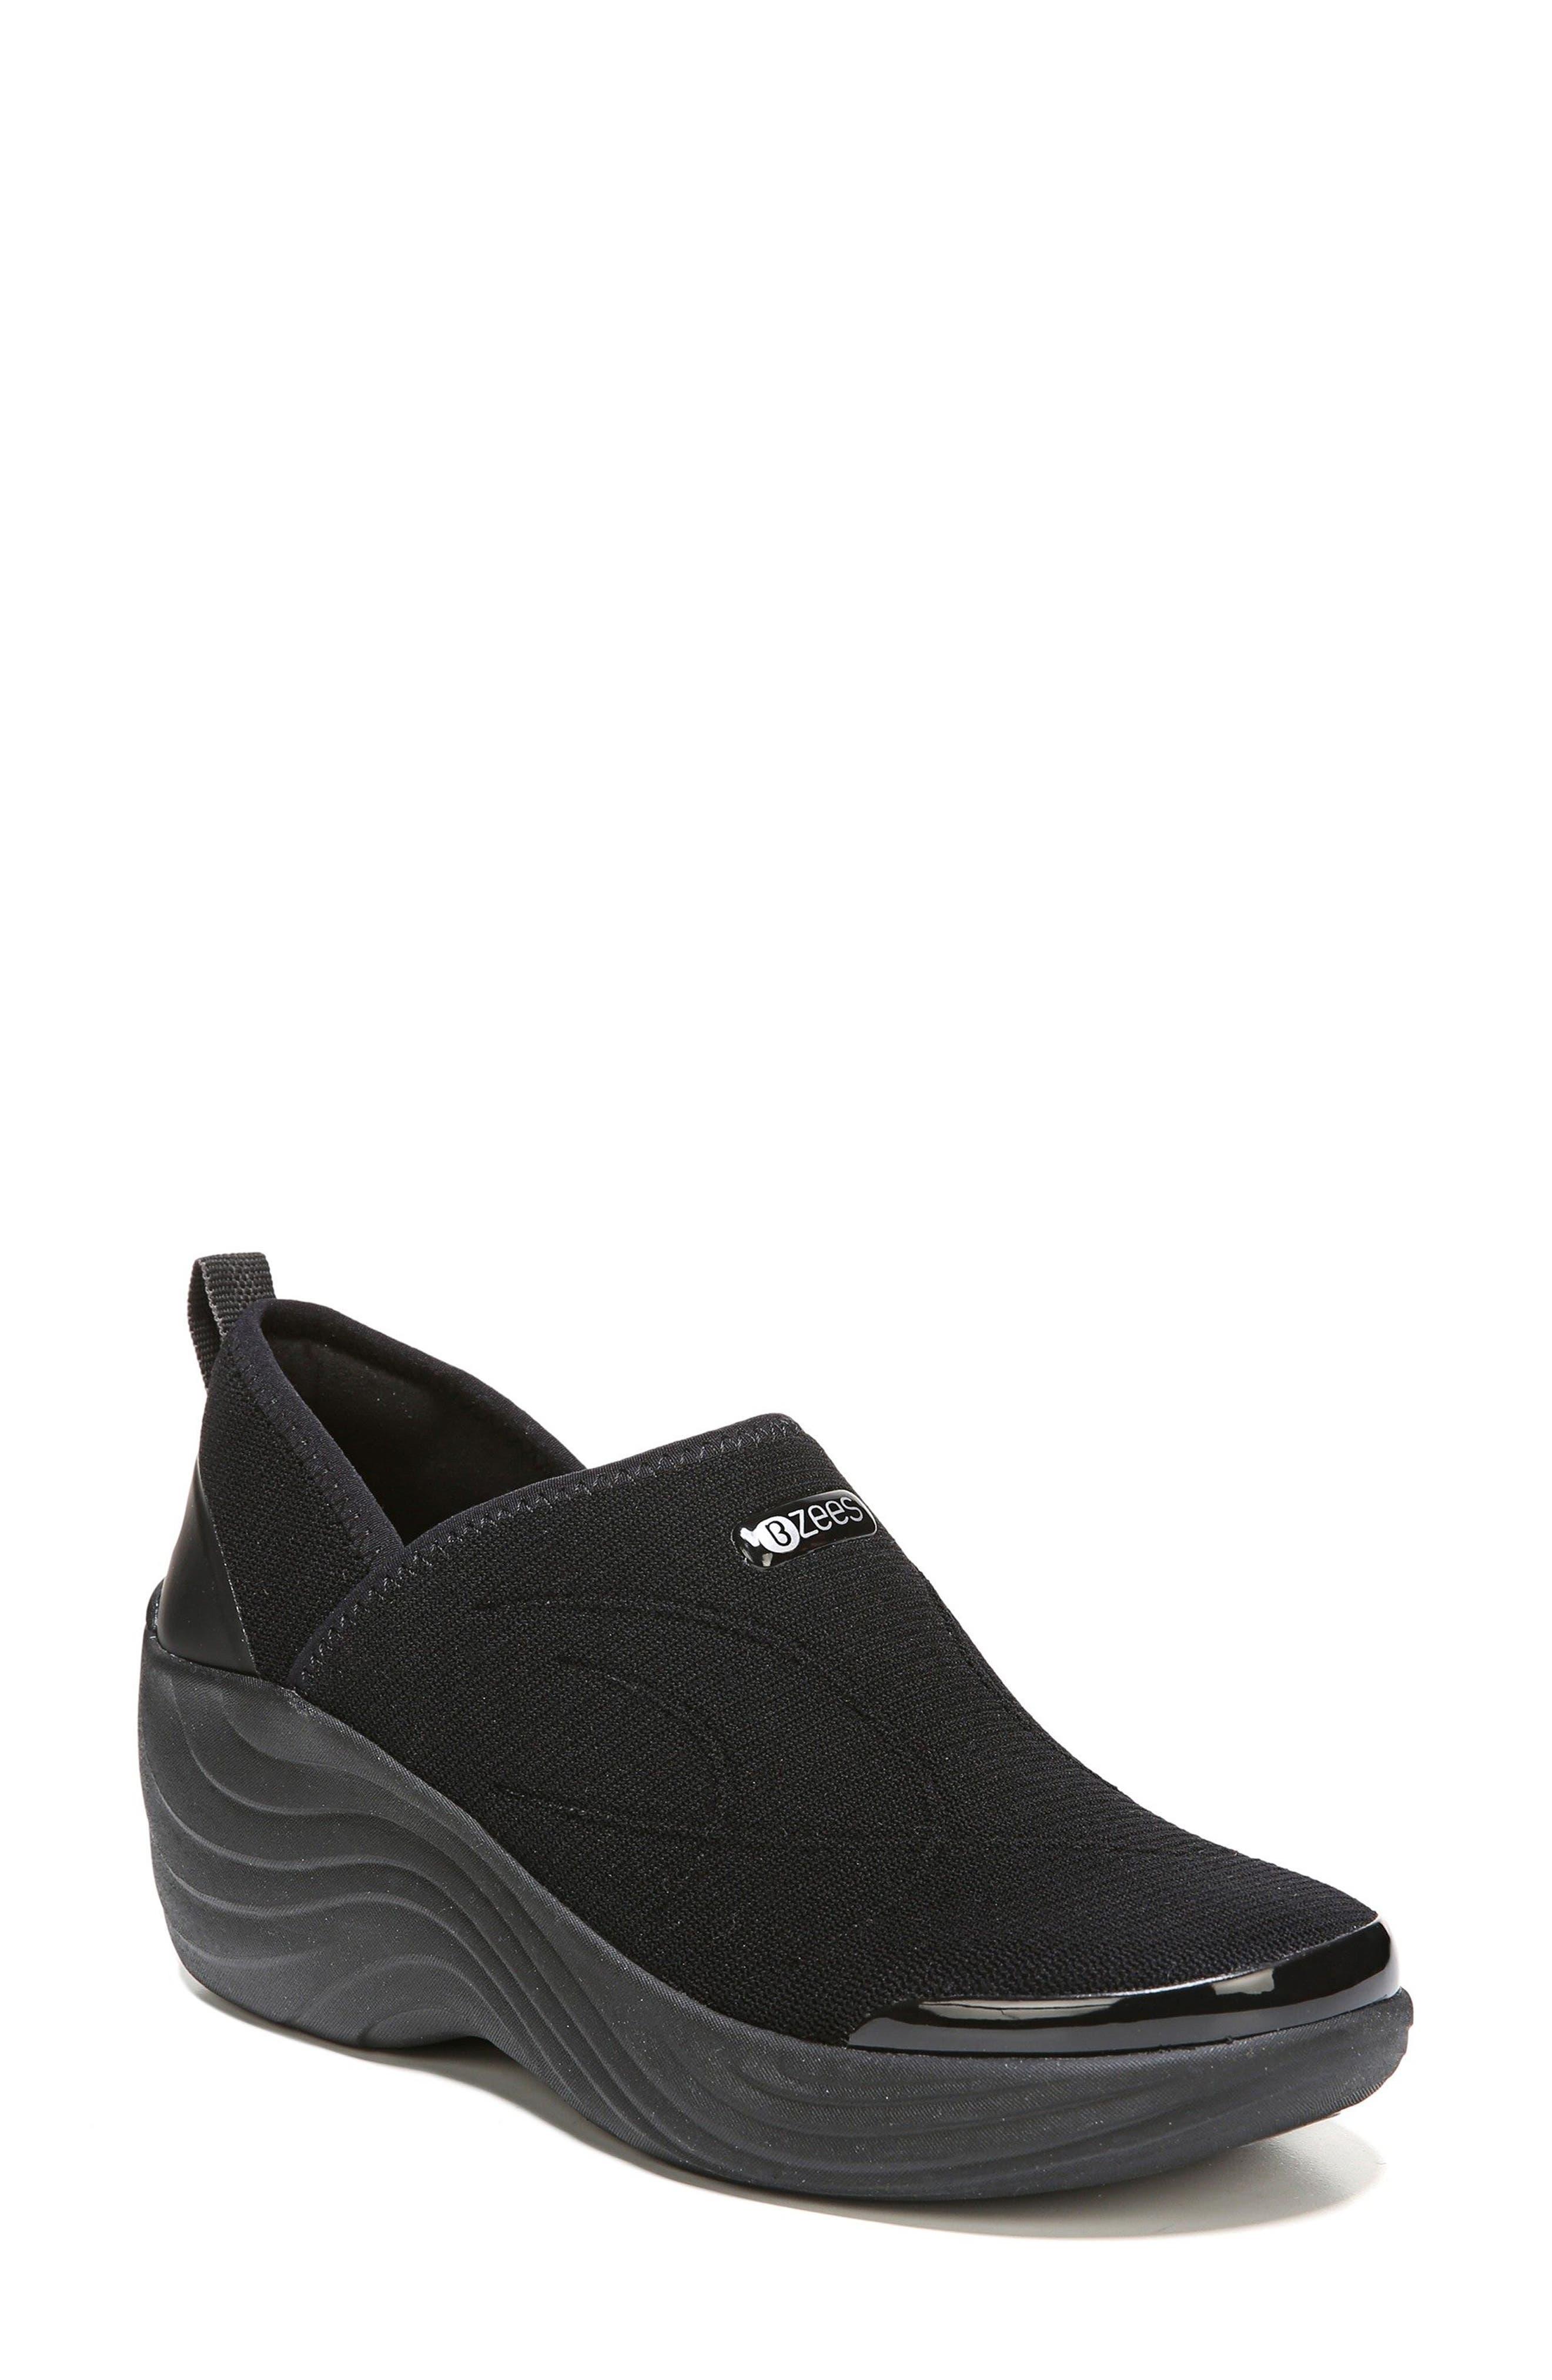 BZEES   Zsa Zsa Wedge Sneaker